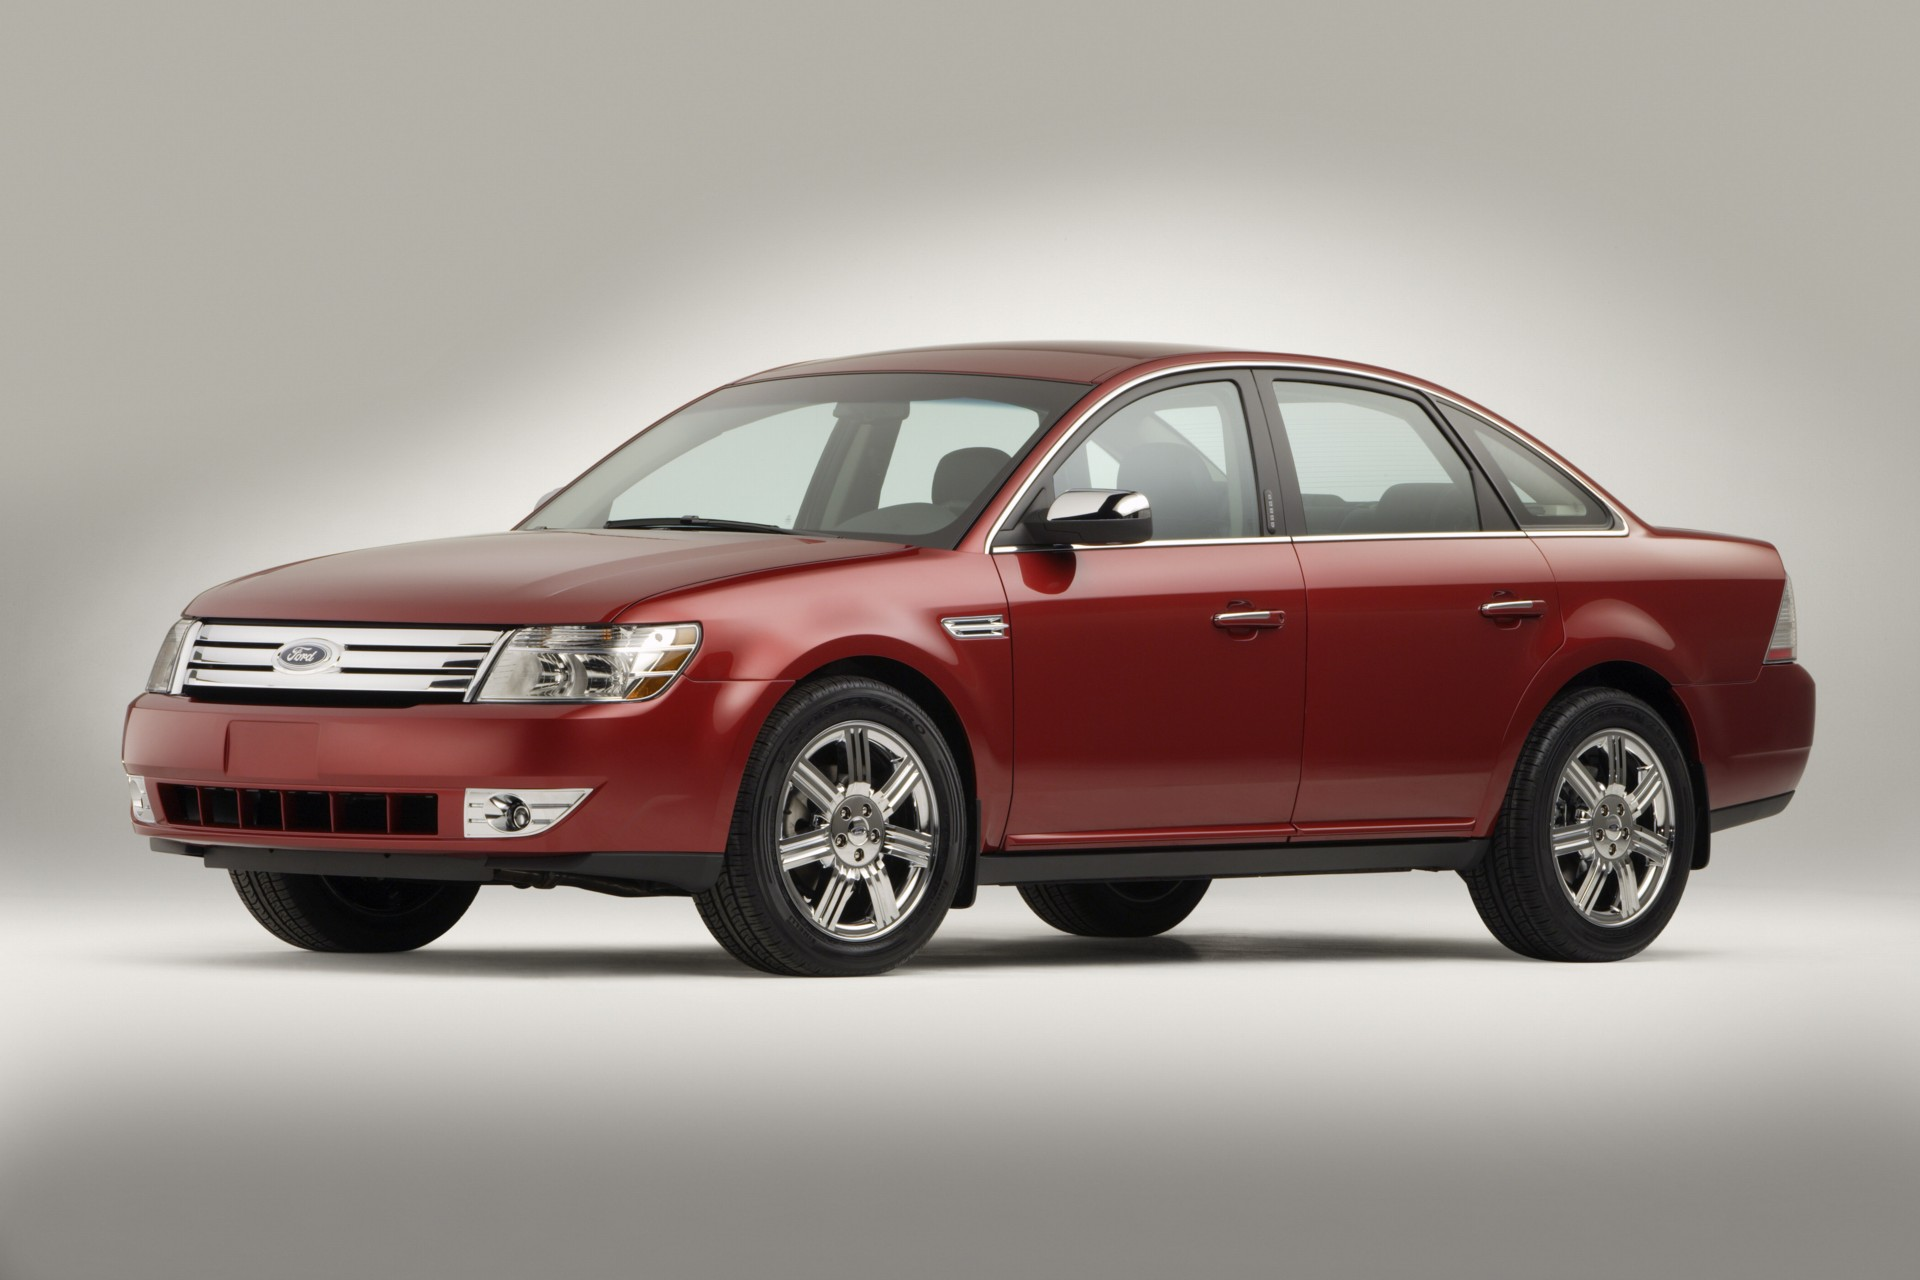 https://www.conceptcarz.com/images/Ford/Ford_Taurus_manu-08_01.jpg